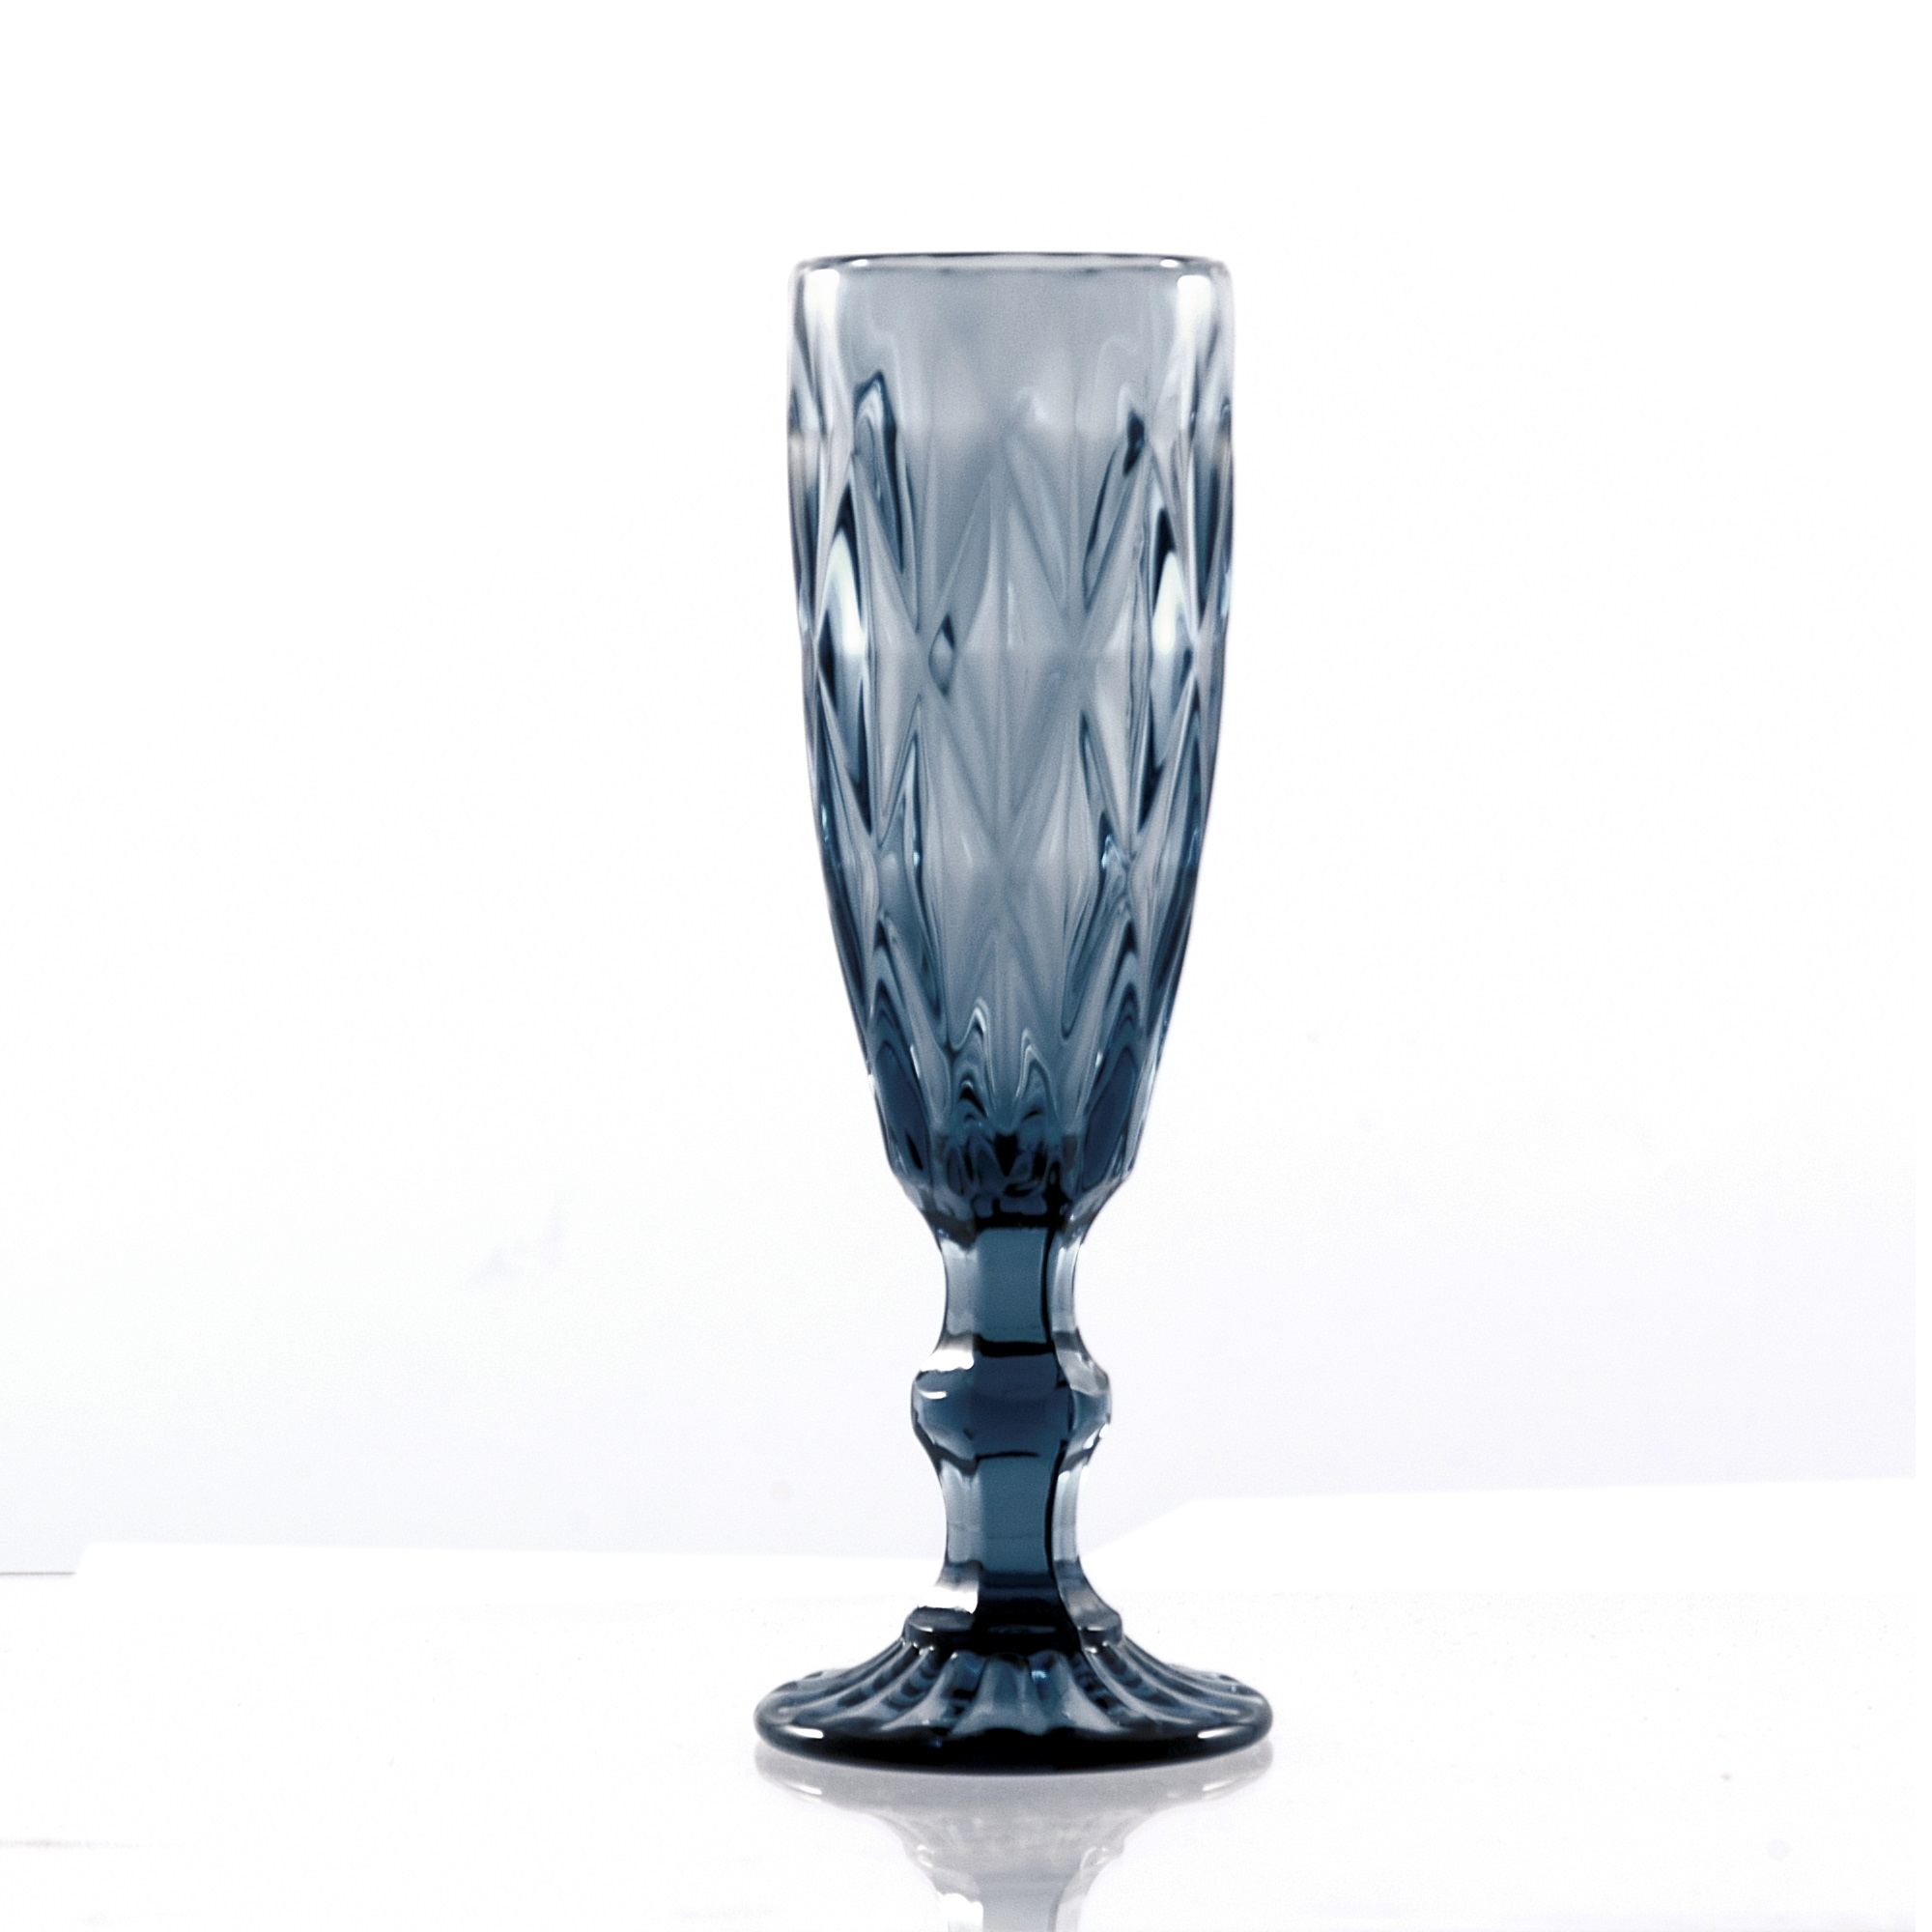 Formahouse | Dining / Glassware / BLUE DIAMOND Flute